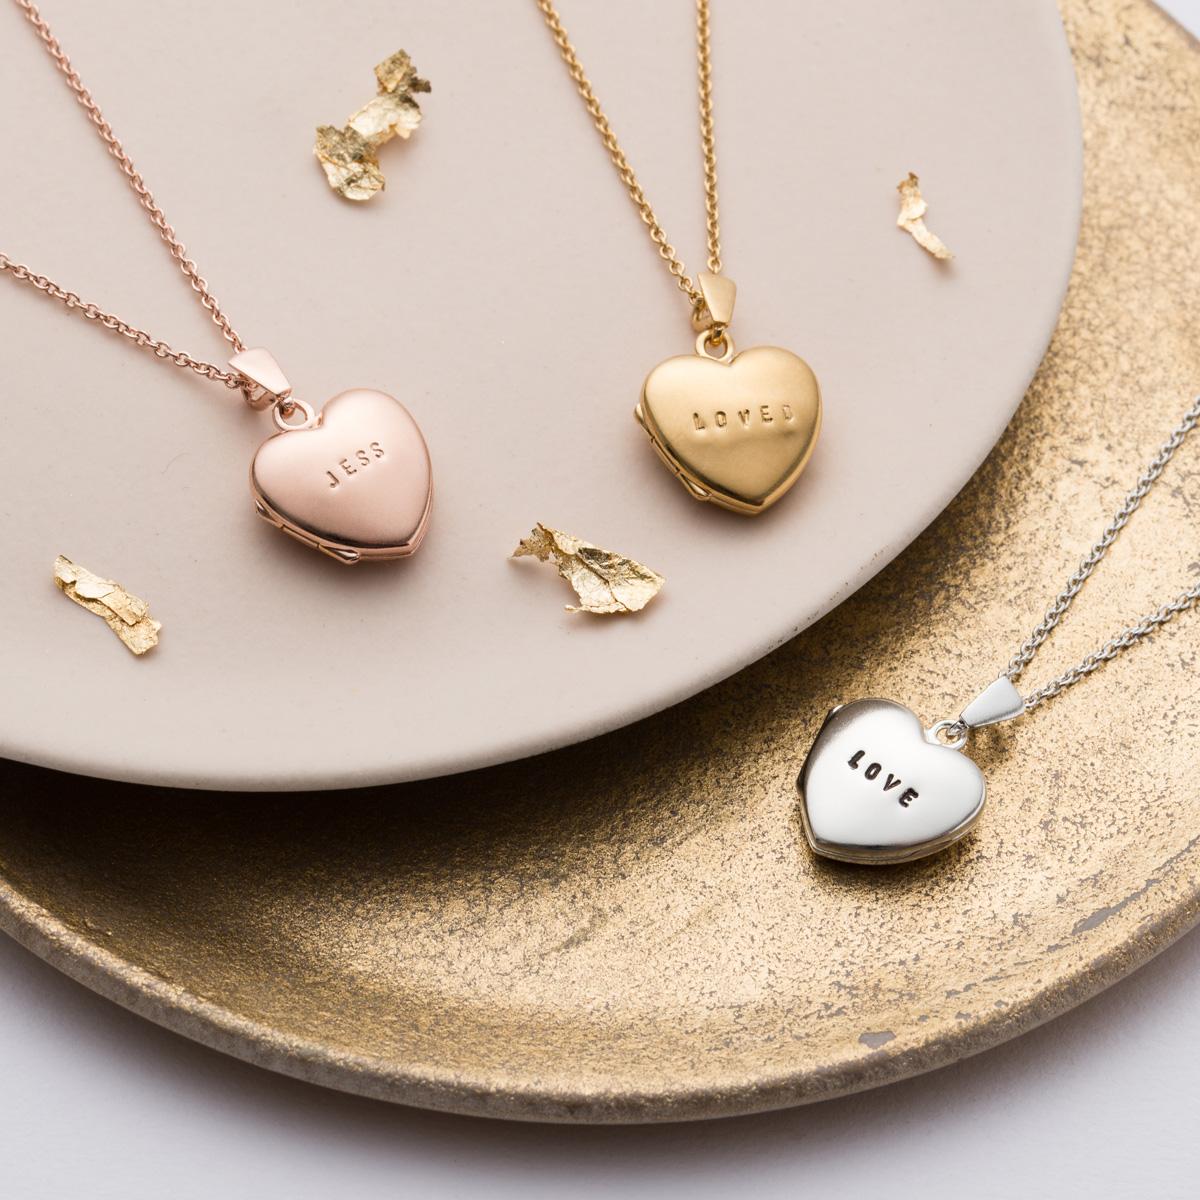 Personalised Posh Totty Designs Heart Locket